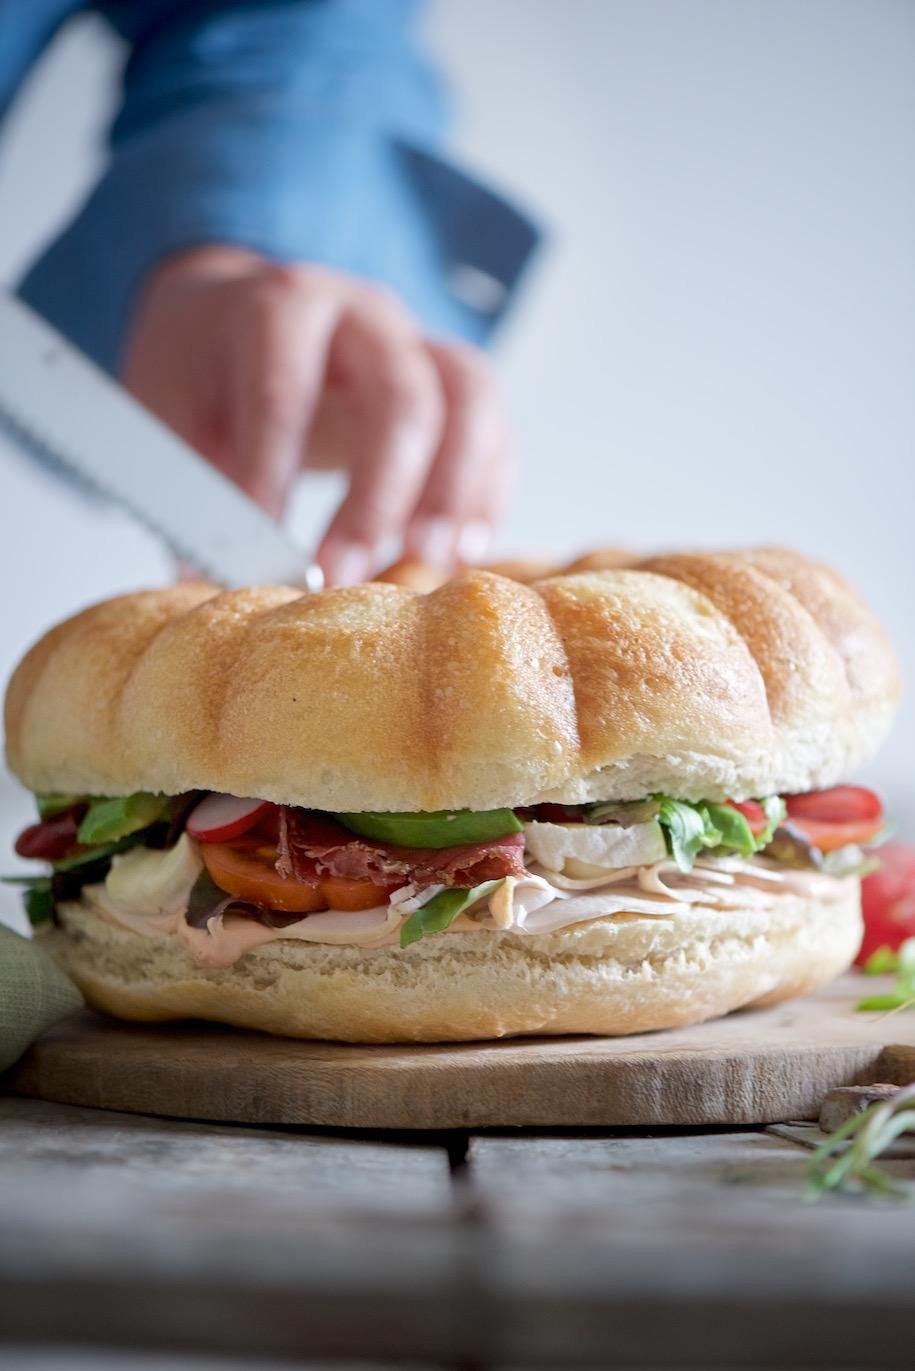 bundtwich